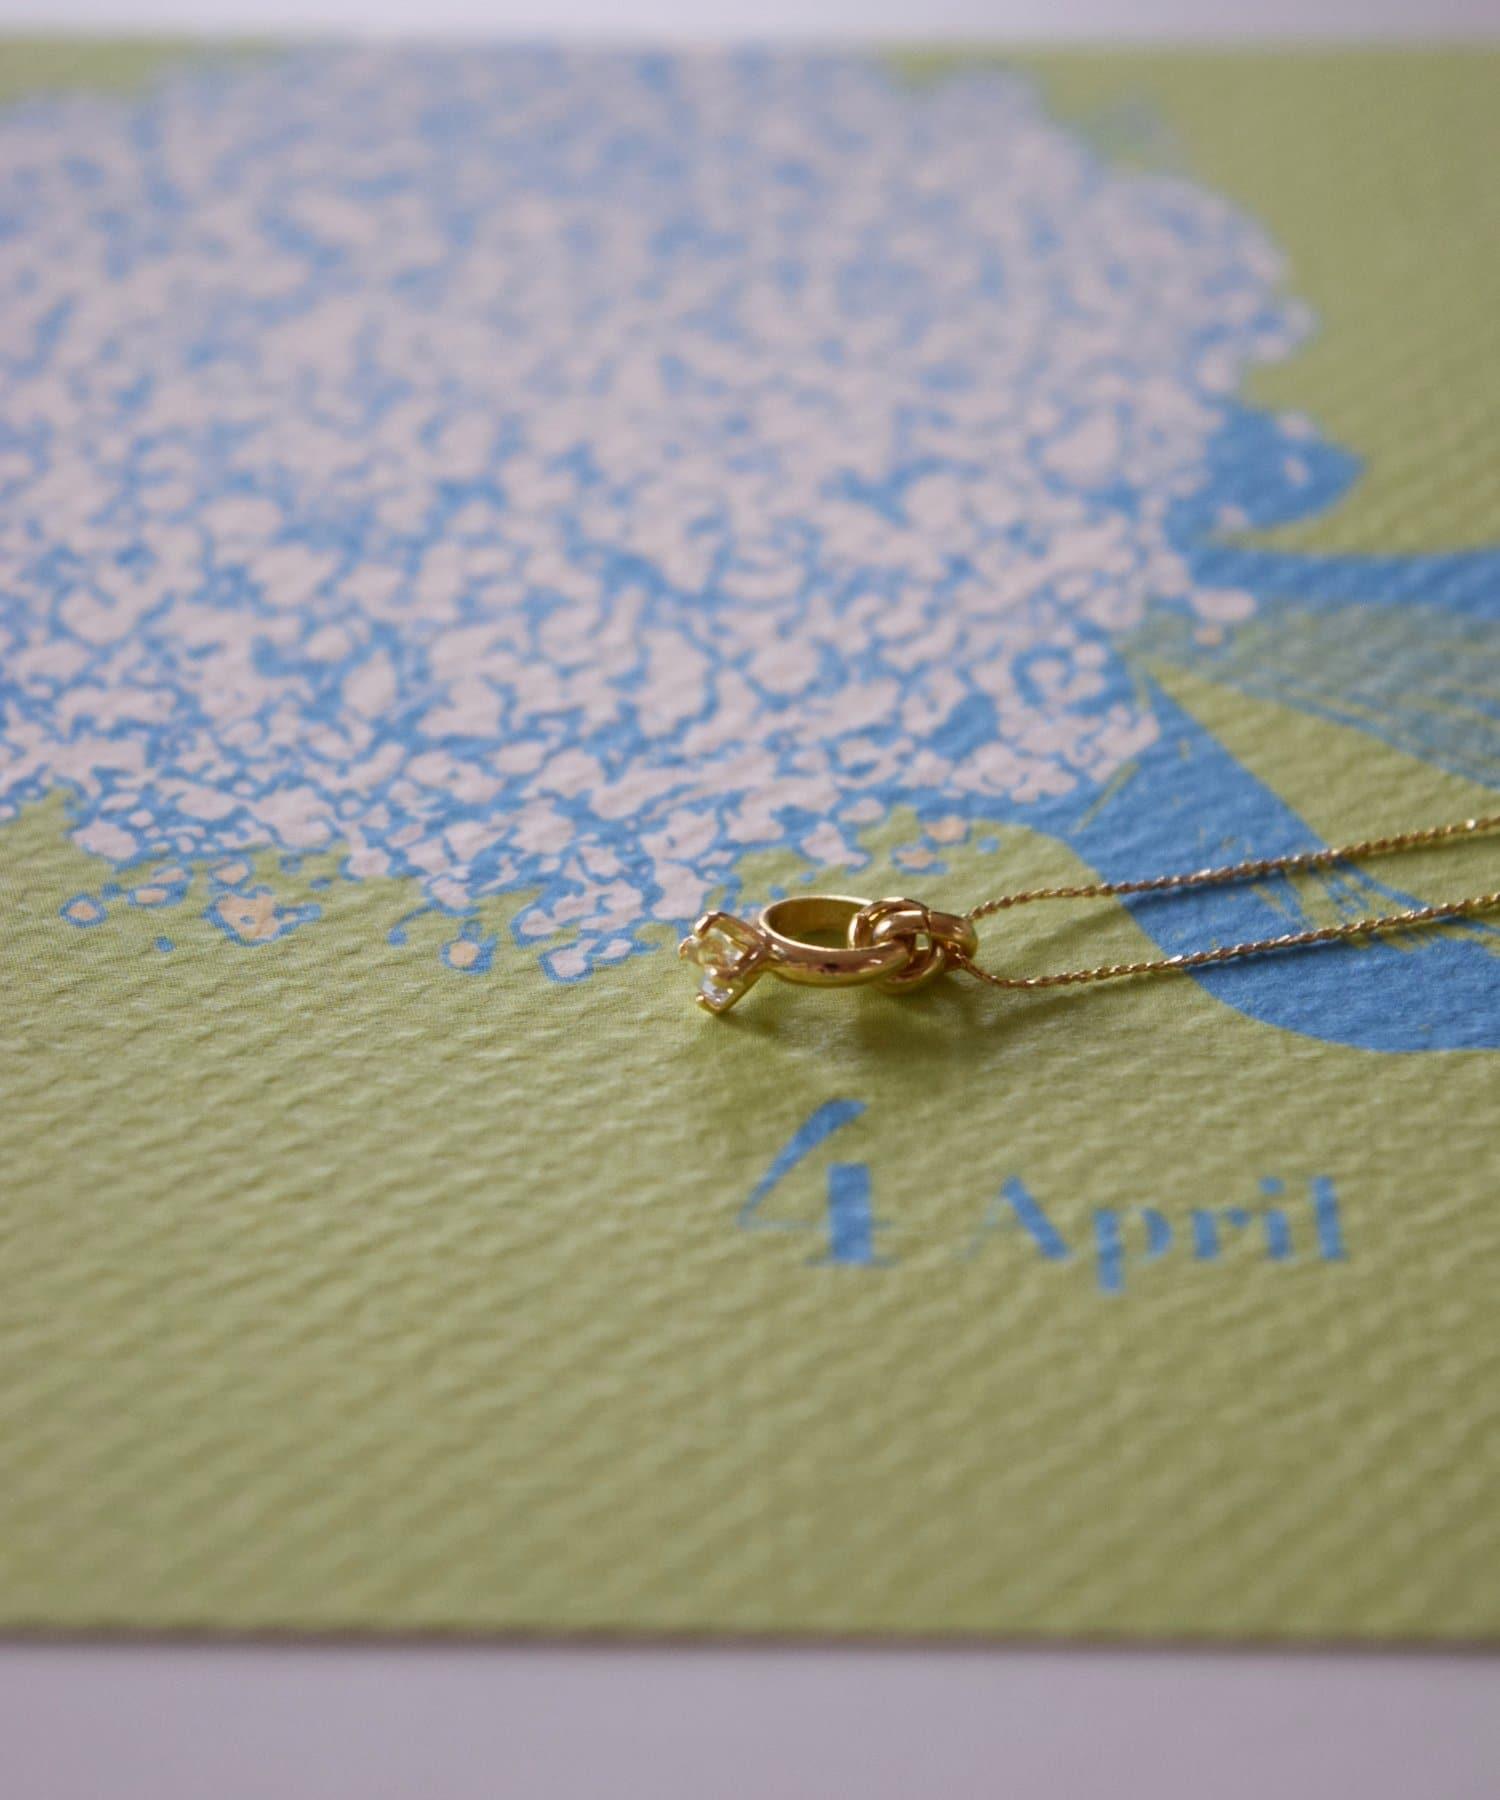 BIRTHDAY BAR(バースデイバー) レディース Birthstone Petit Ring Necklace 誕生石ネックレス その他